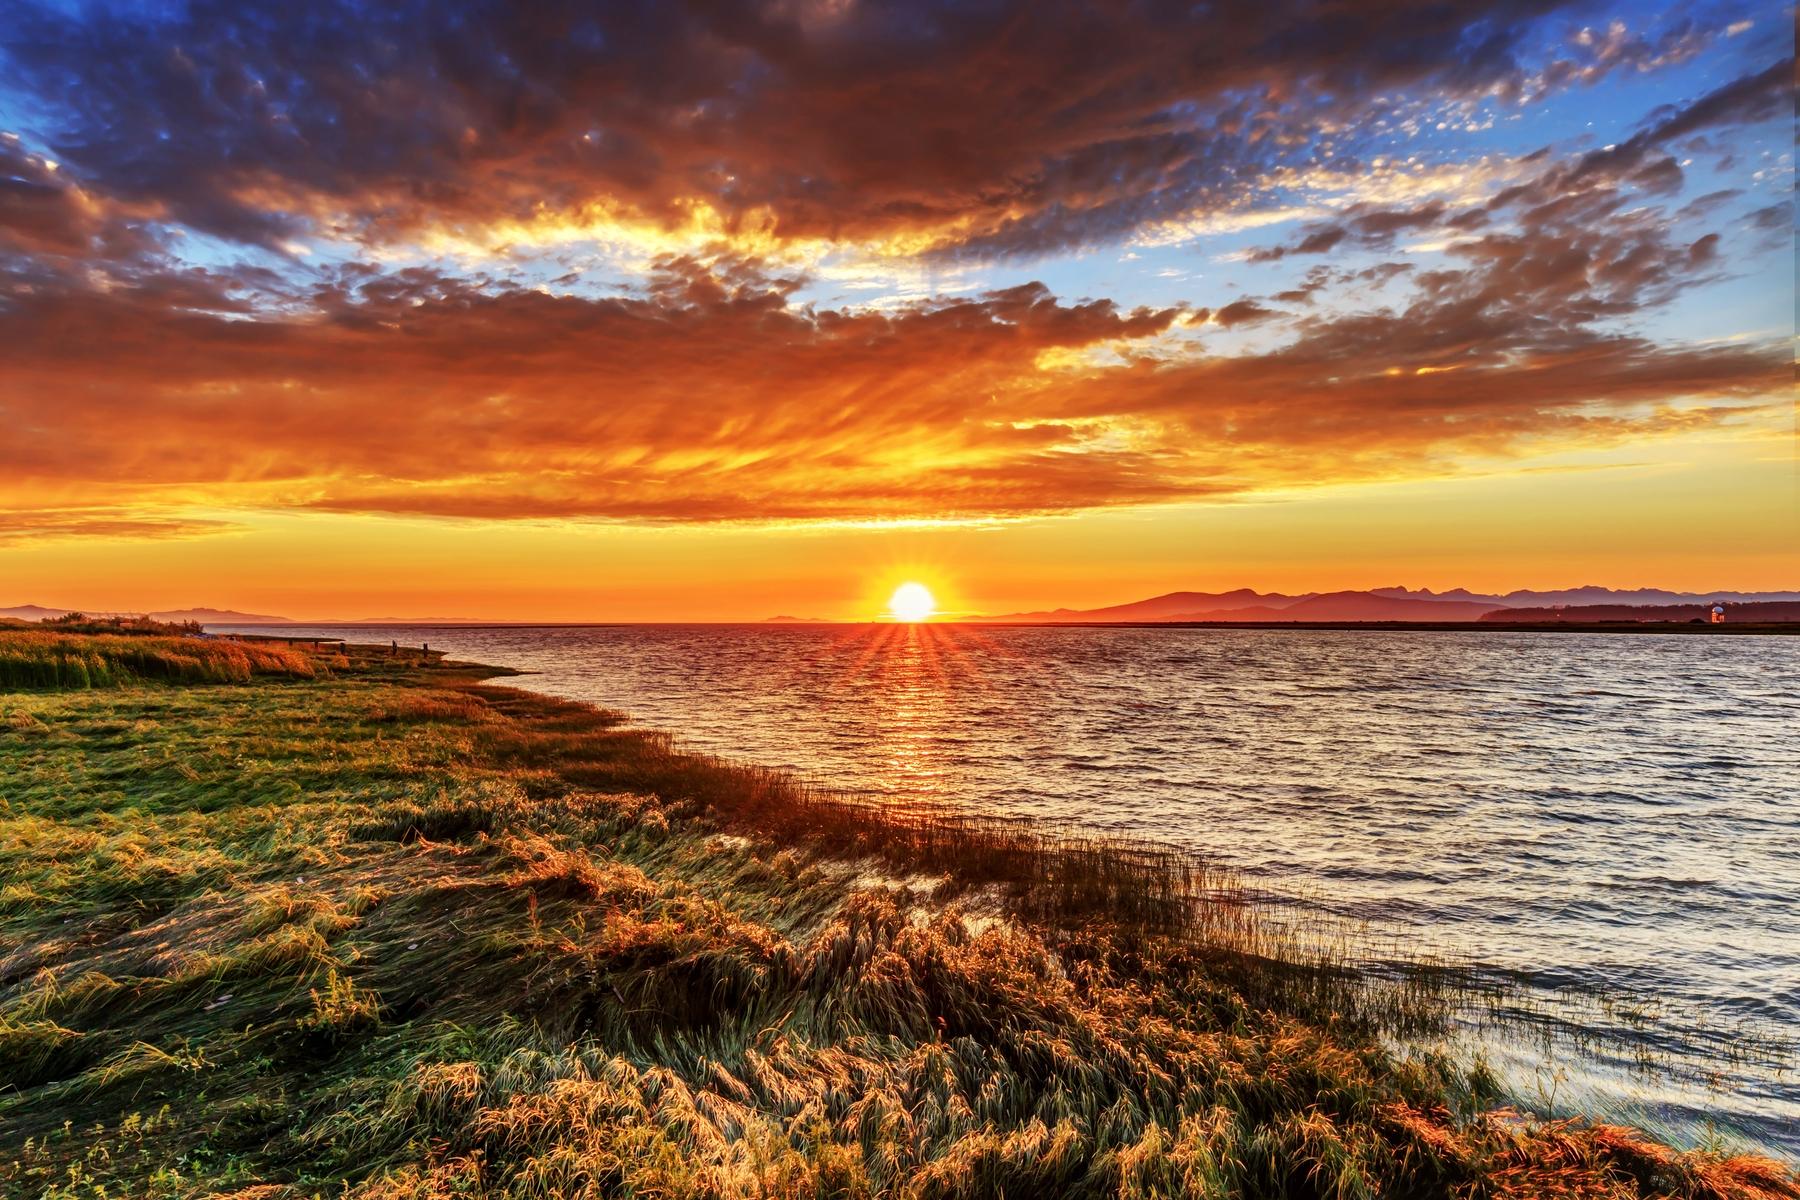 hiking in British Columbia coast by sunset